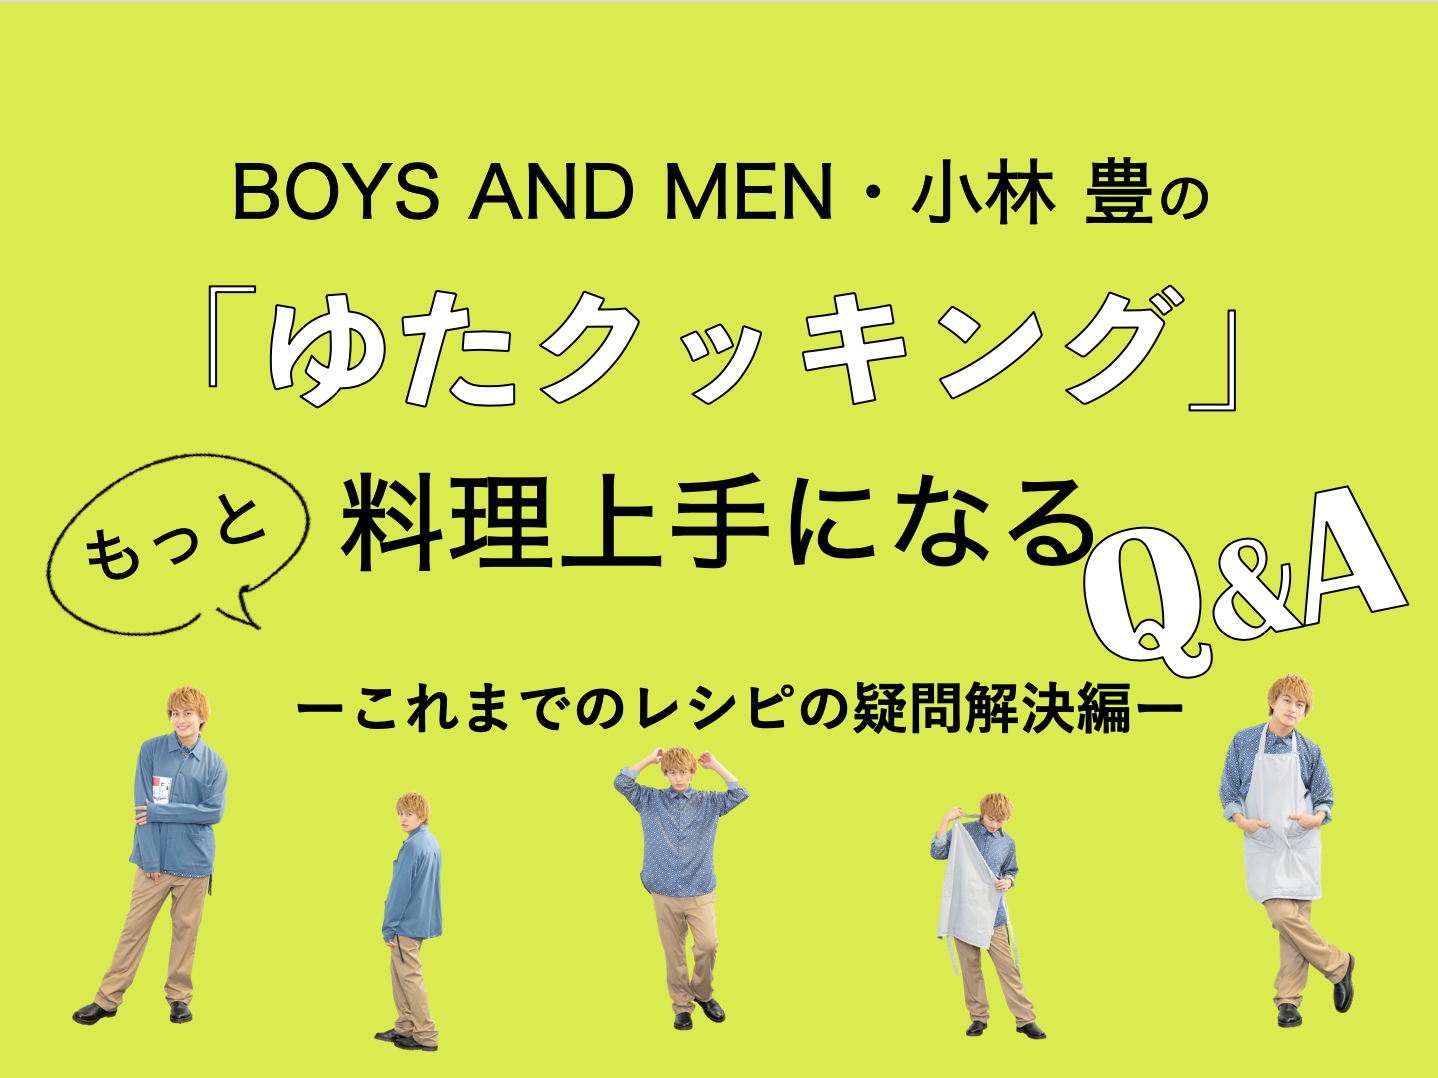 BOYS AND MEN 小林豊 ゆたクッキング 連載 cancam